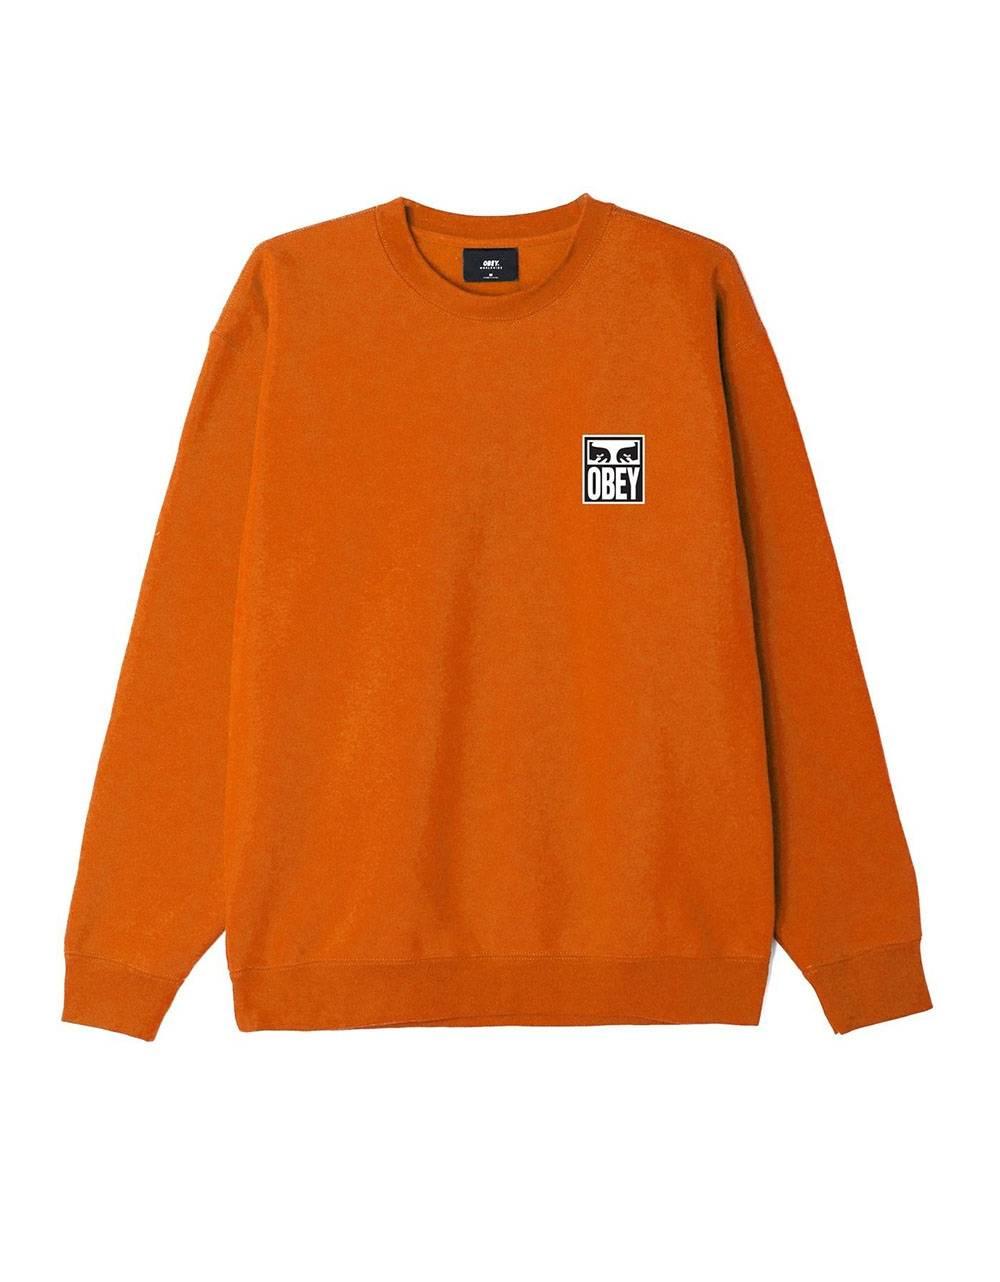 Obey eyes icon II premium crewneck sweater - Pumpkin spice obey Sweater 81,15€